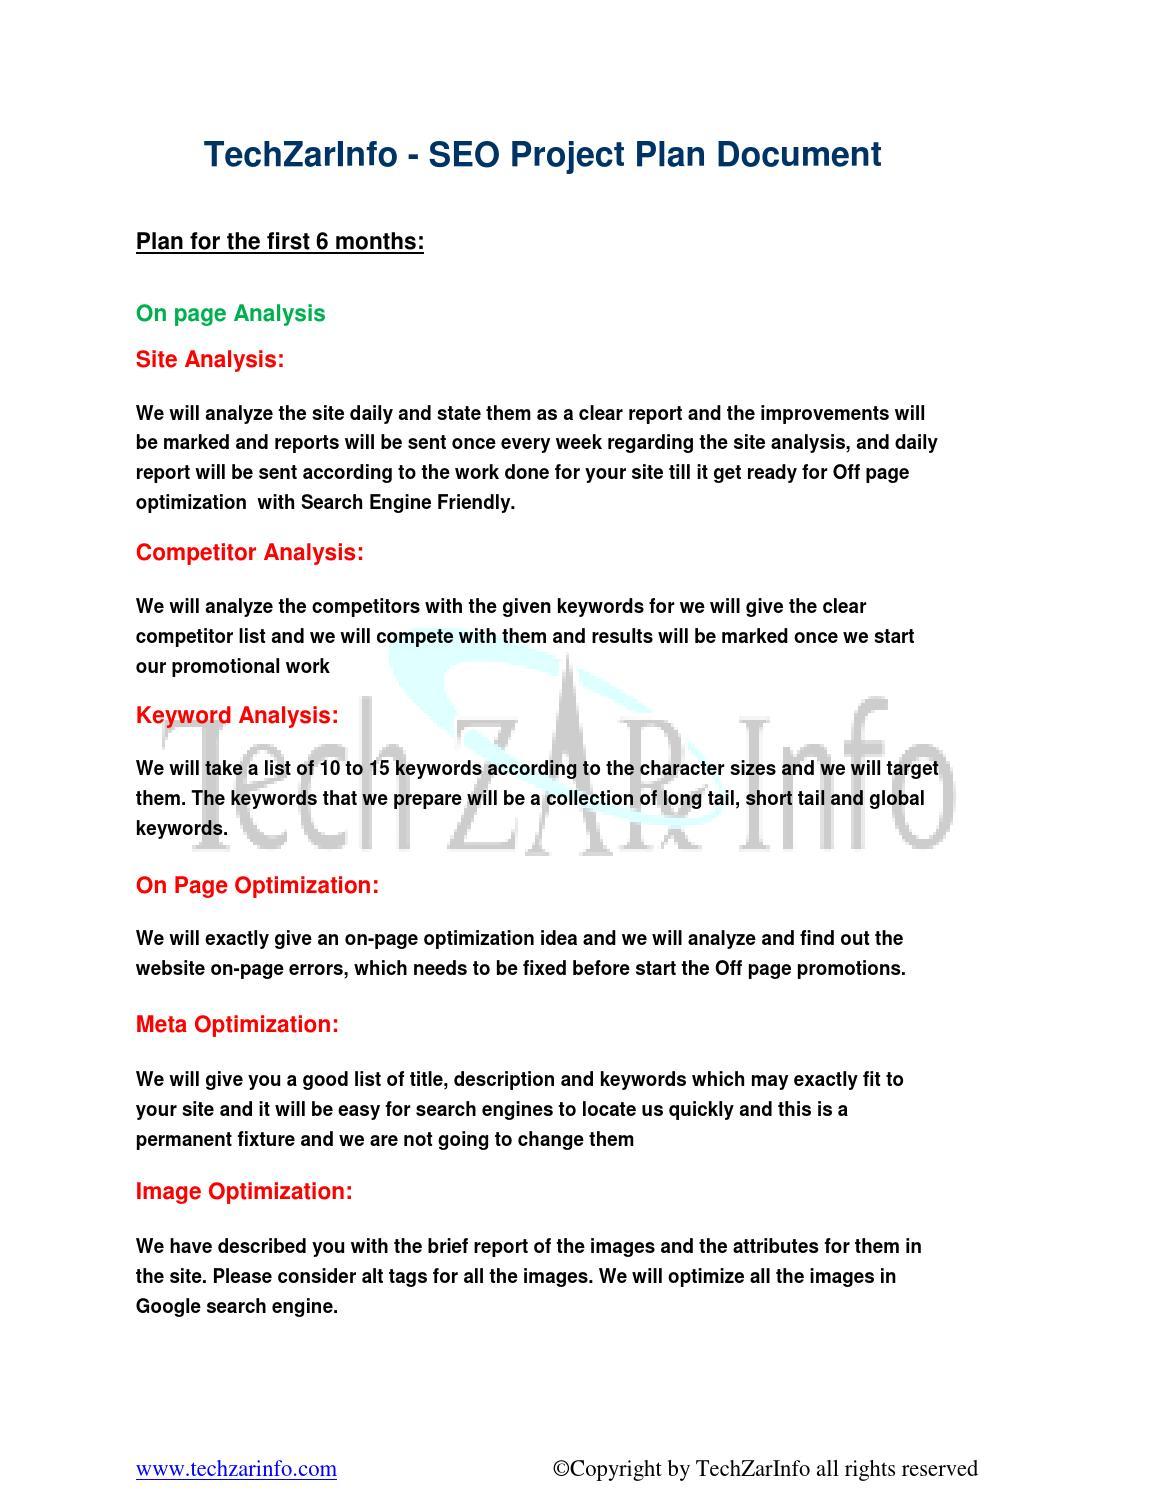 TechZarInfo SEO Project Plan Document by Zar Bro - issuu